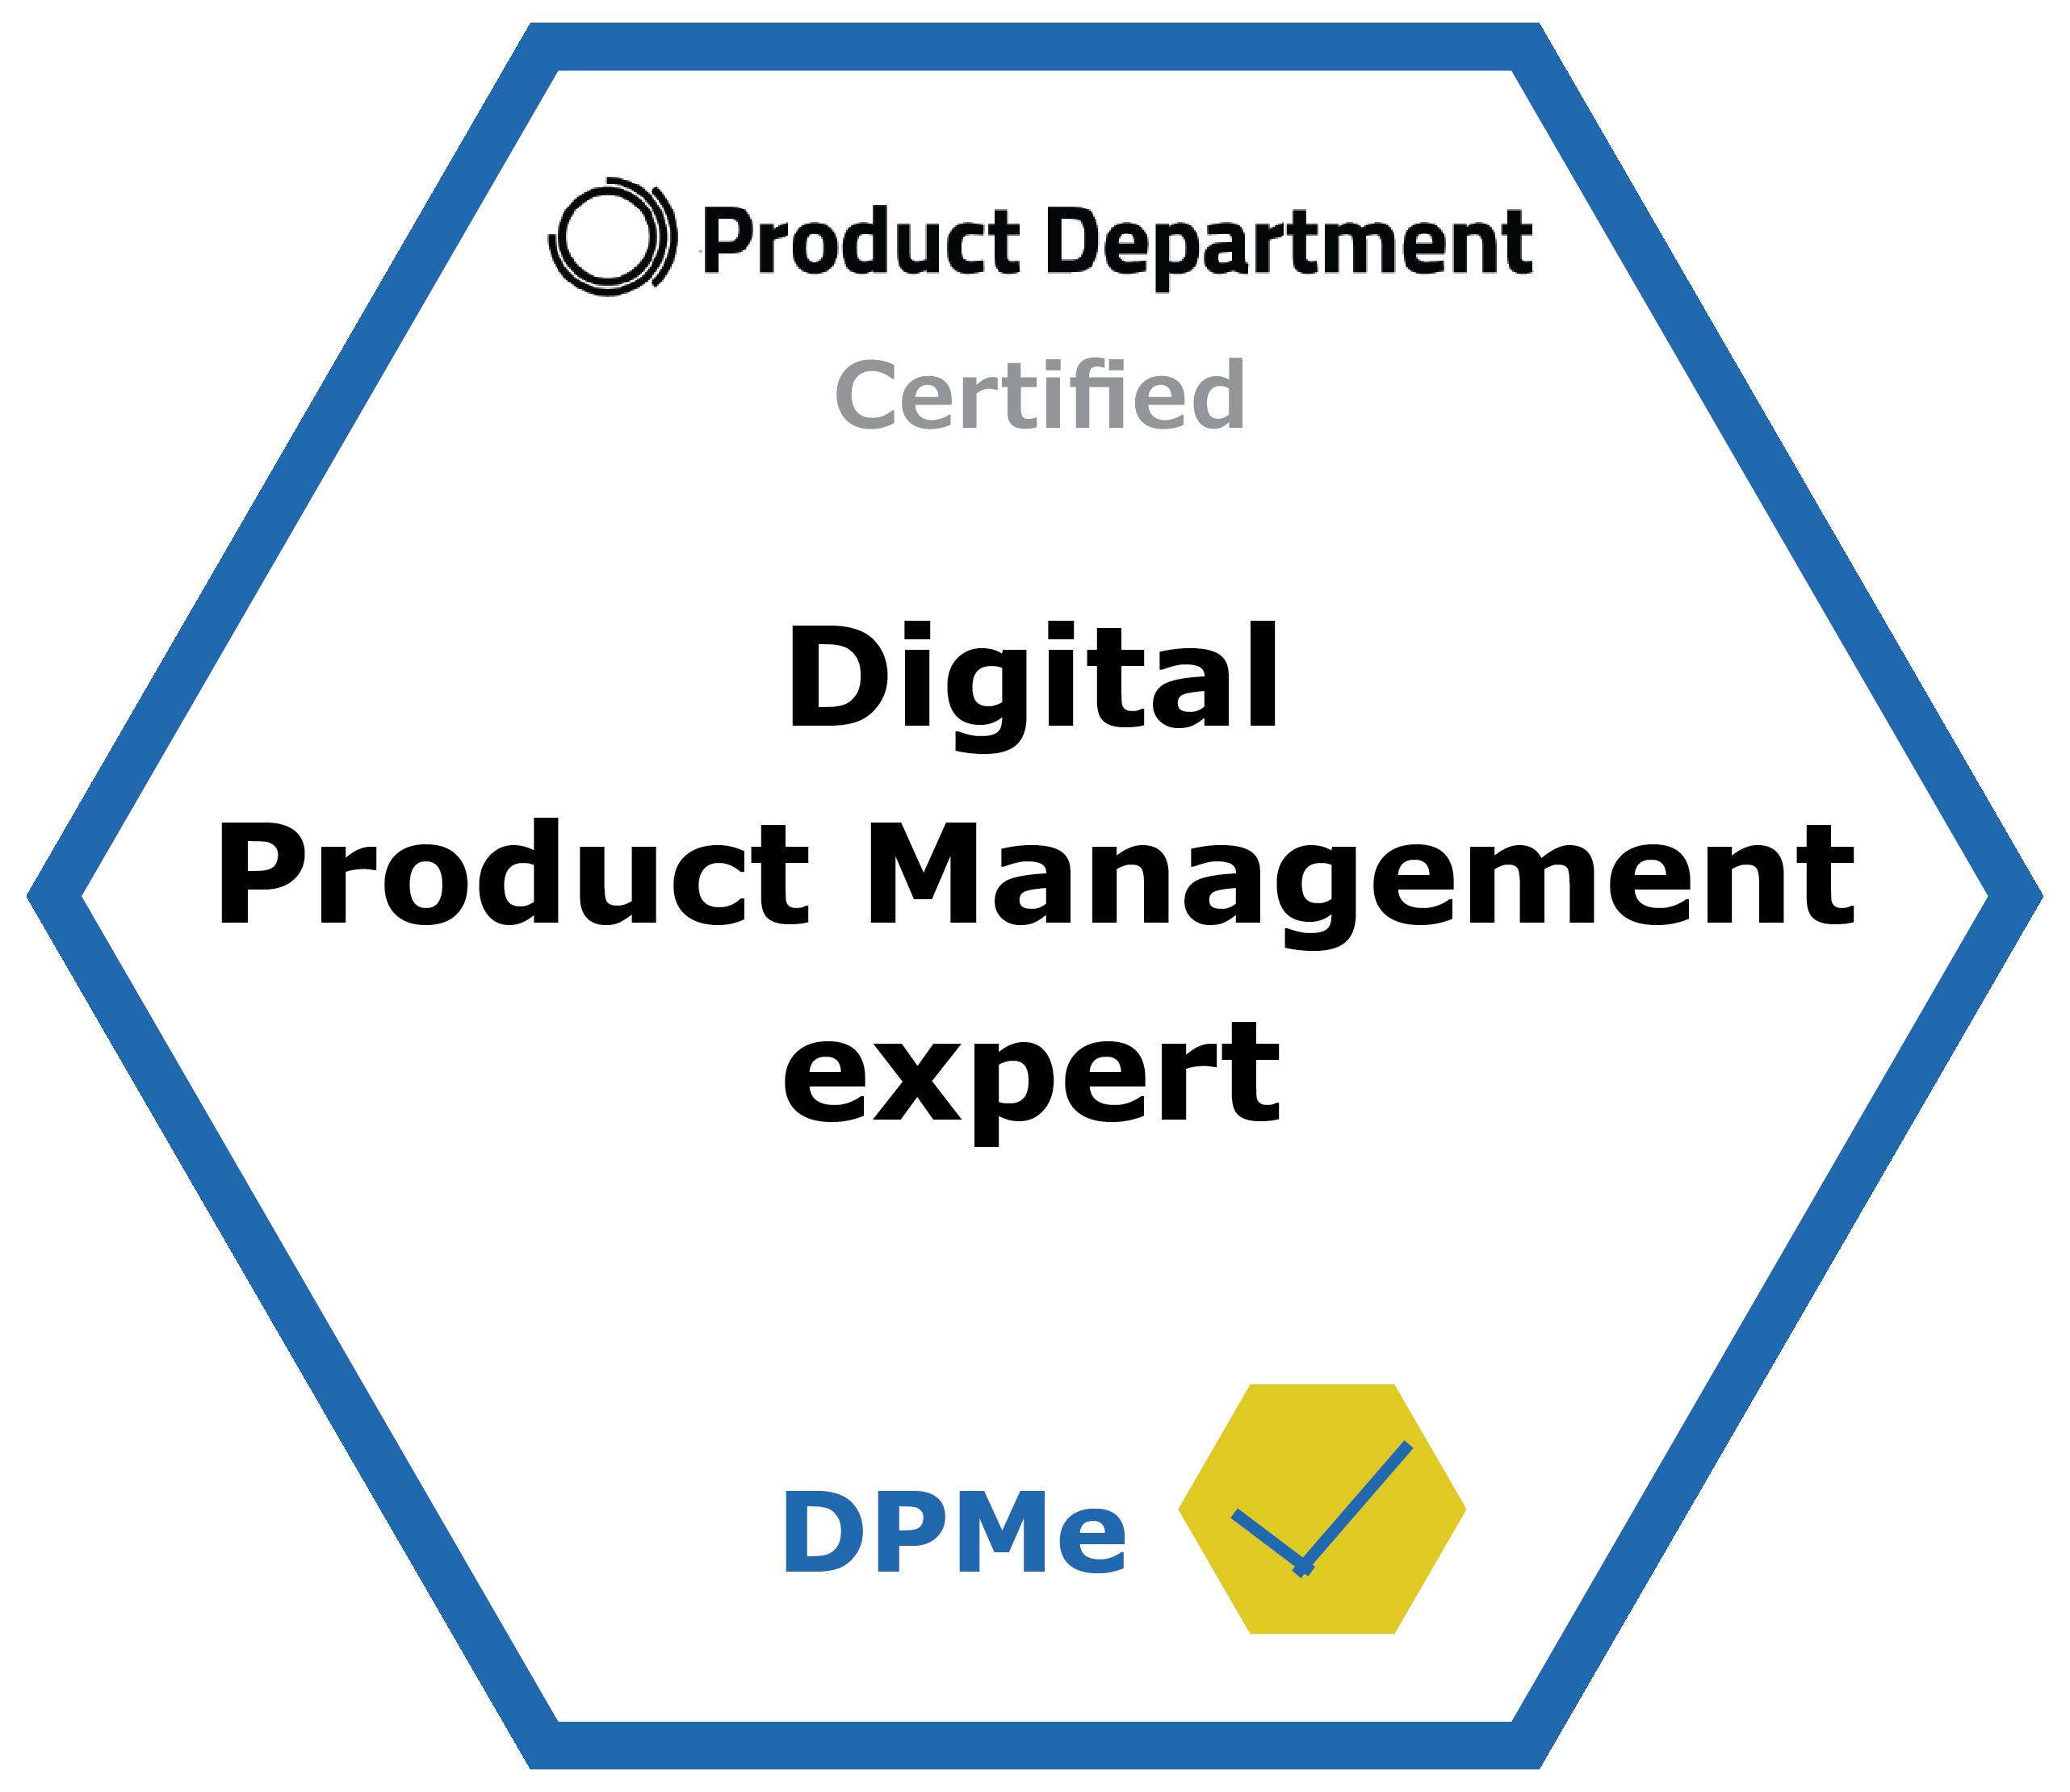 Afbeelding Certified Digital Product Management expert logo